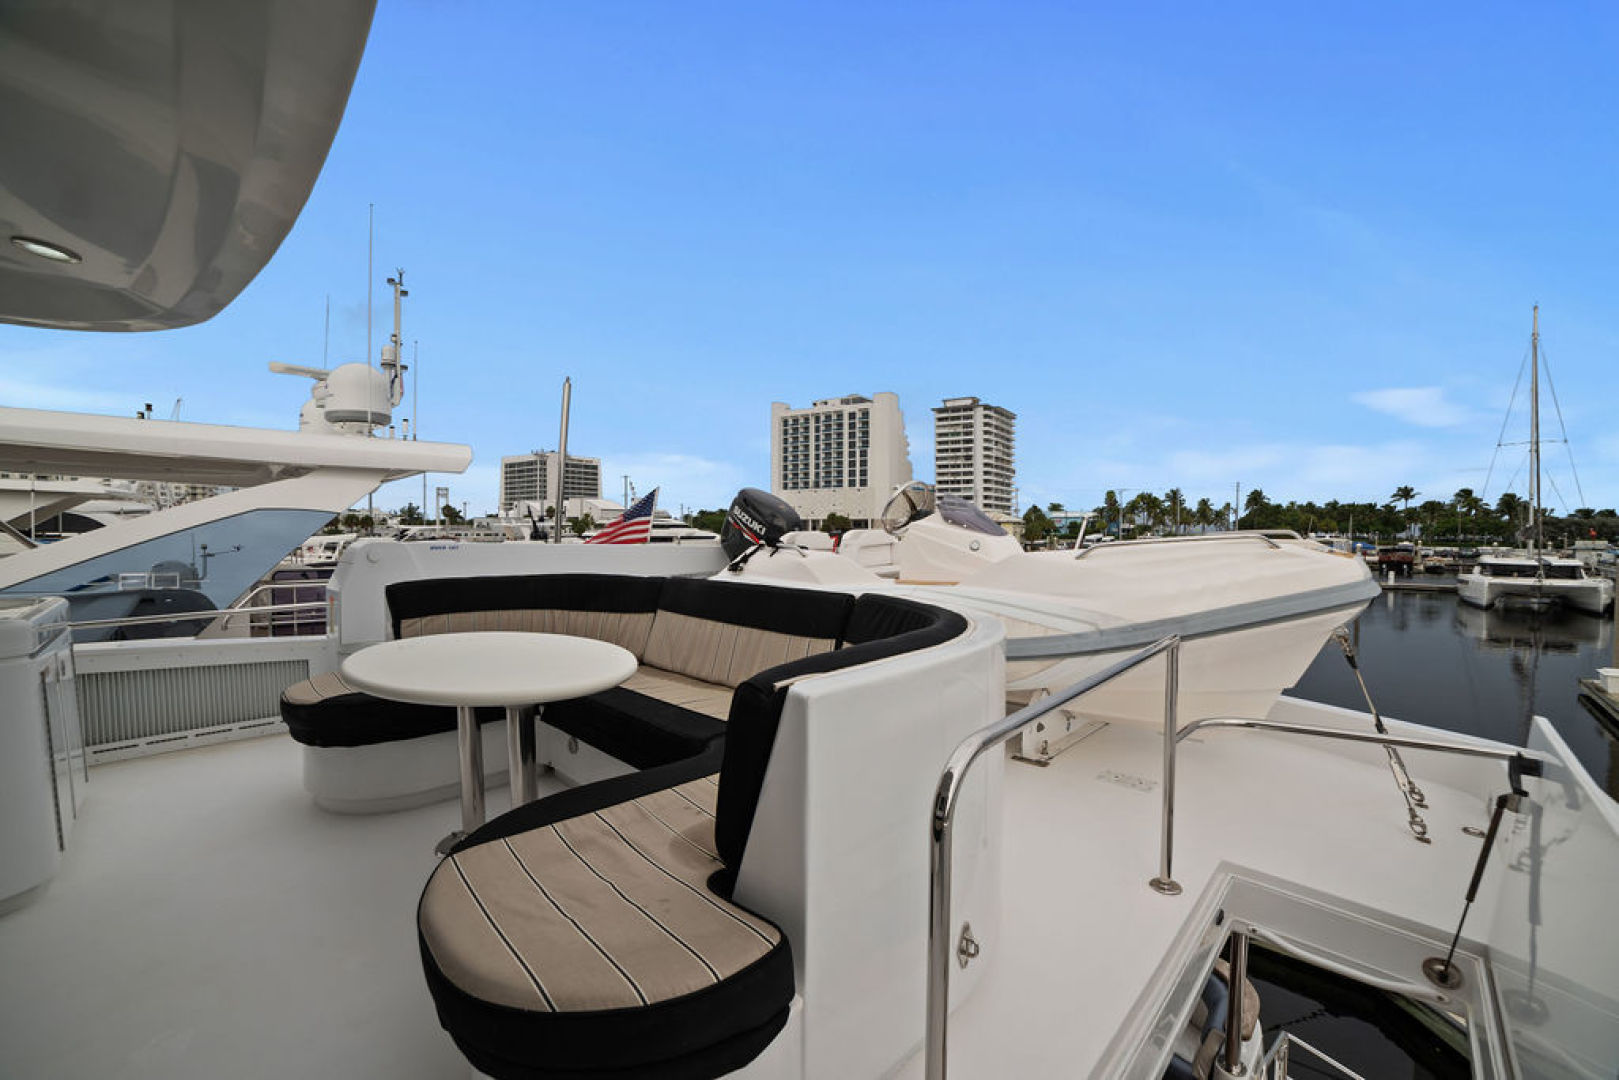 Hatteras-Enclosed Flybridge 2005-LA MER Fort Lauderdale-Florida-United States-Sun Deck-1510608 | Thumbnail